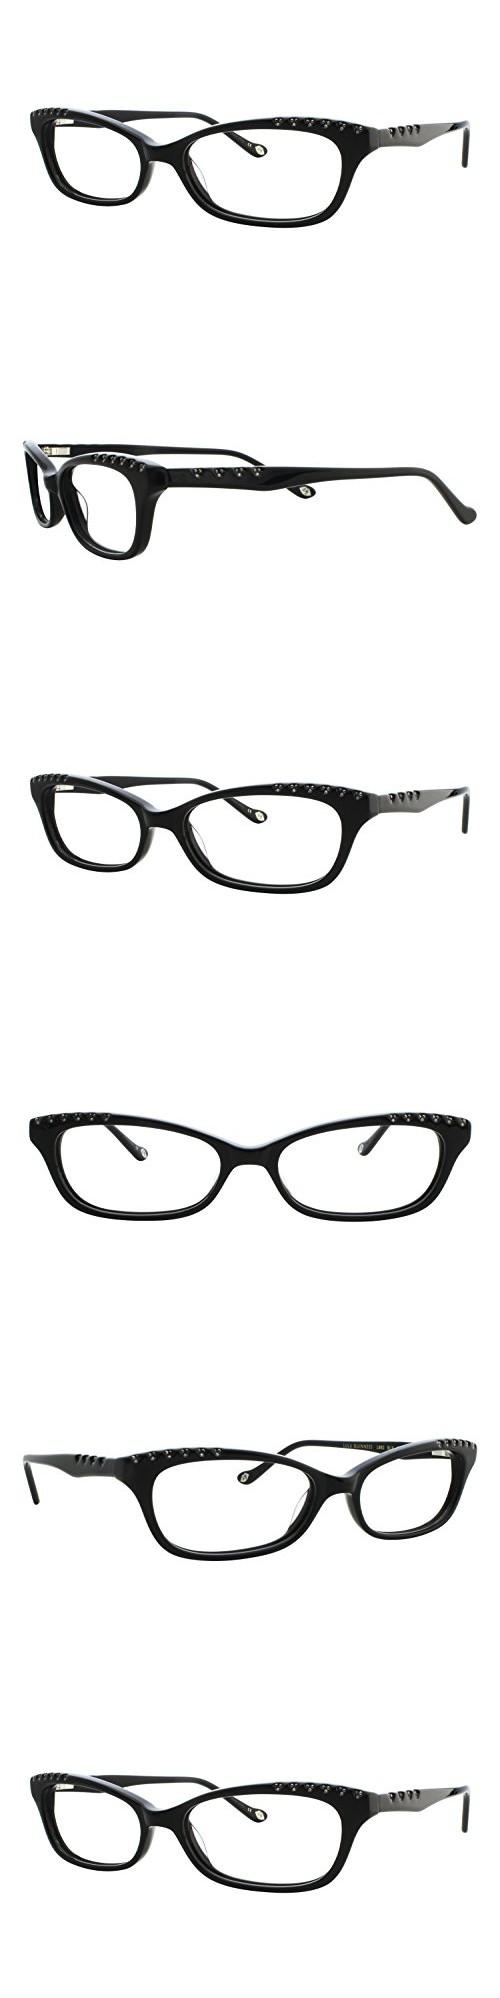 Lulu Guinness L882 Womens Eyeglass Frames - Black